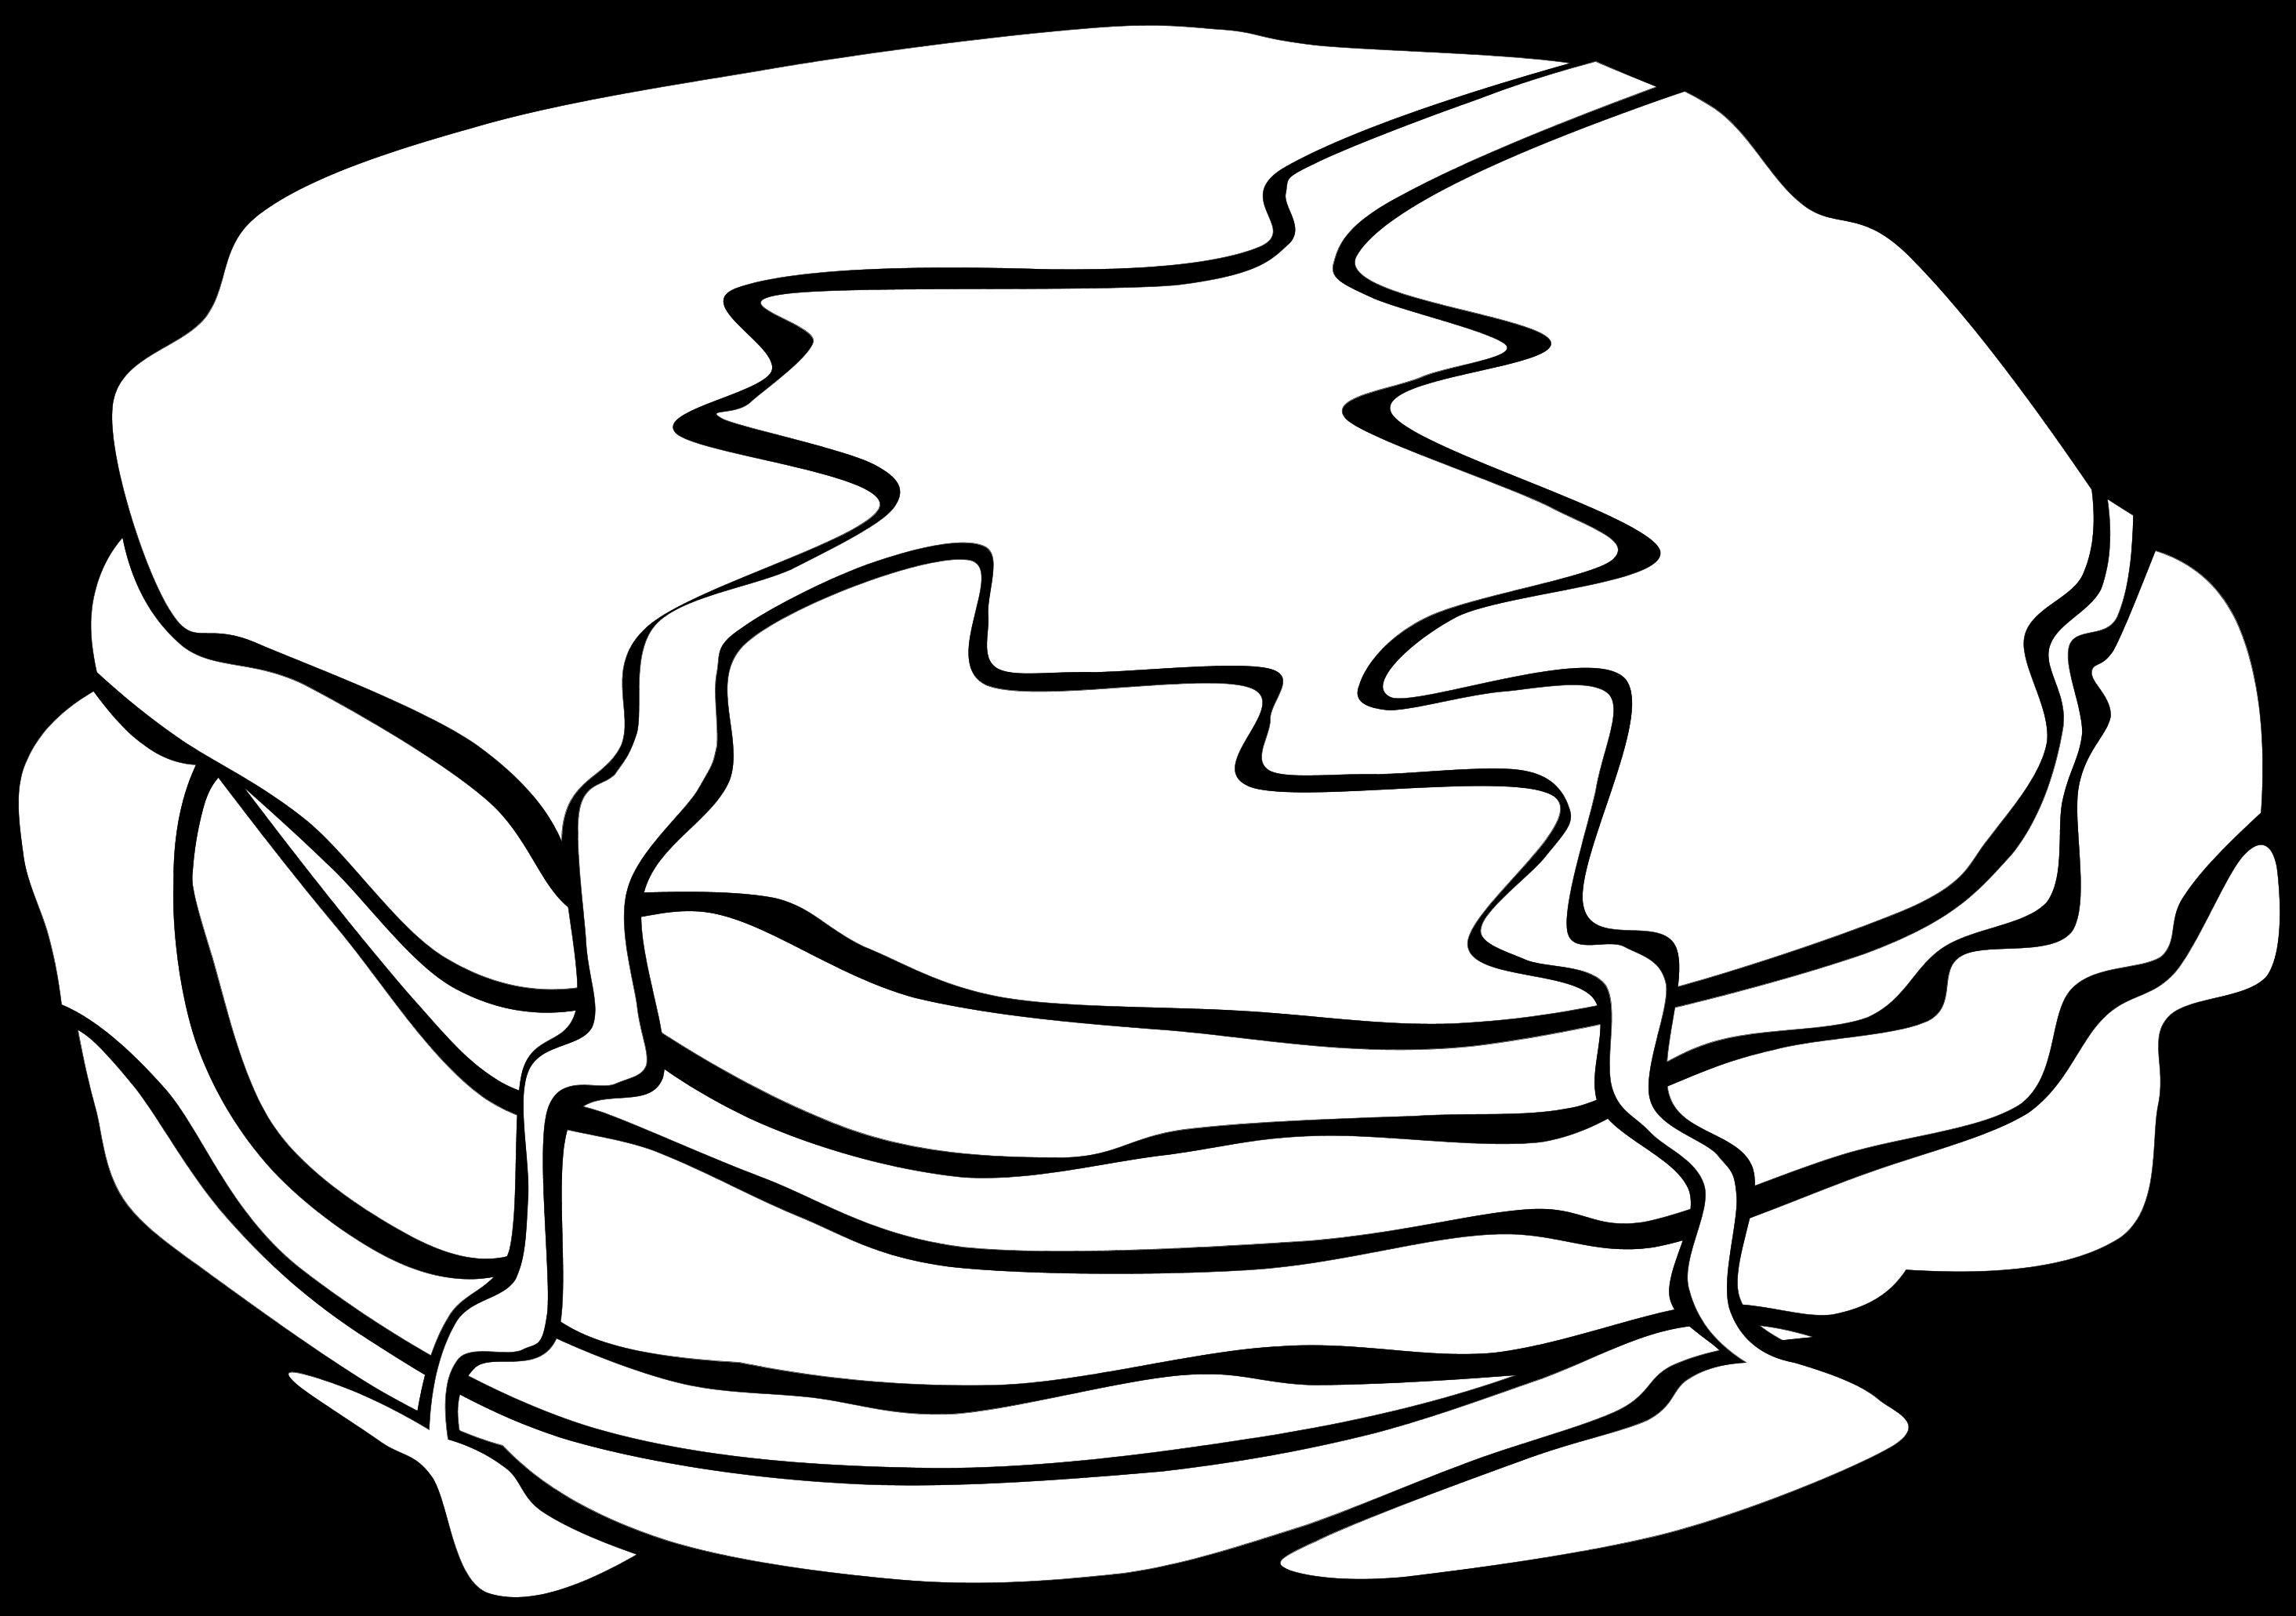 Pancakes clipart black and white jpg transparent stock Pancakes clipart black and white 2 » Clipart Station jpg transparent stock